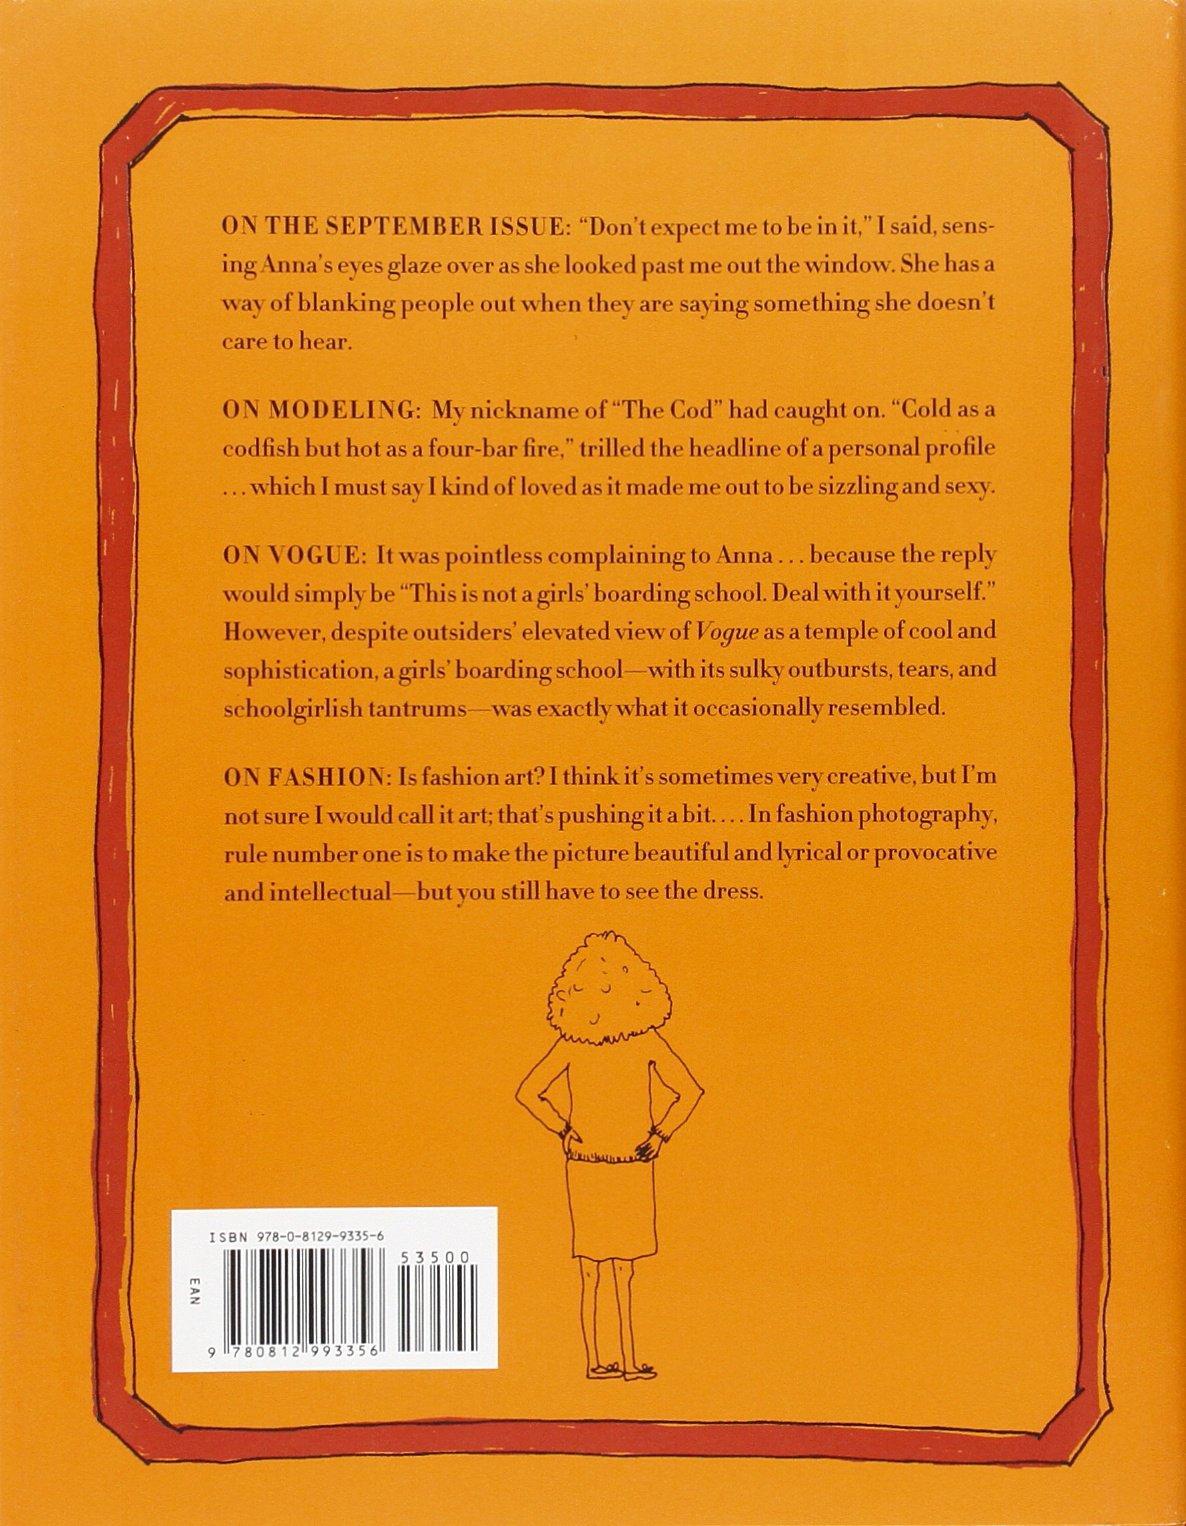 Grace a memoir grace coddington 9780812993356 amazon books fandeluxe Image collections